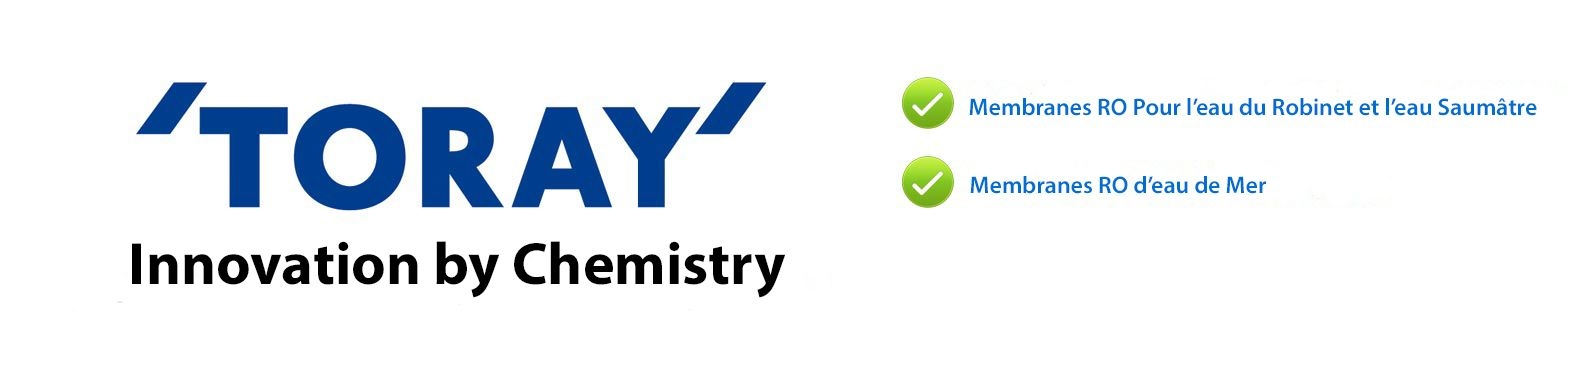 membranes-toray.jpg